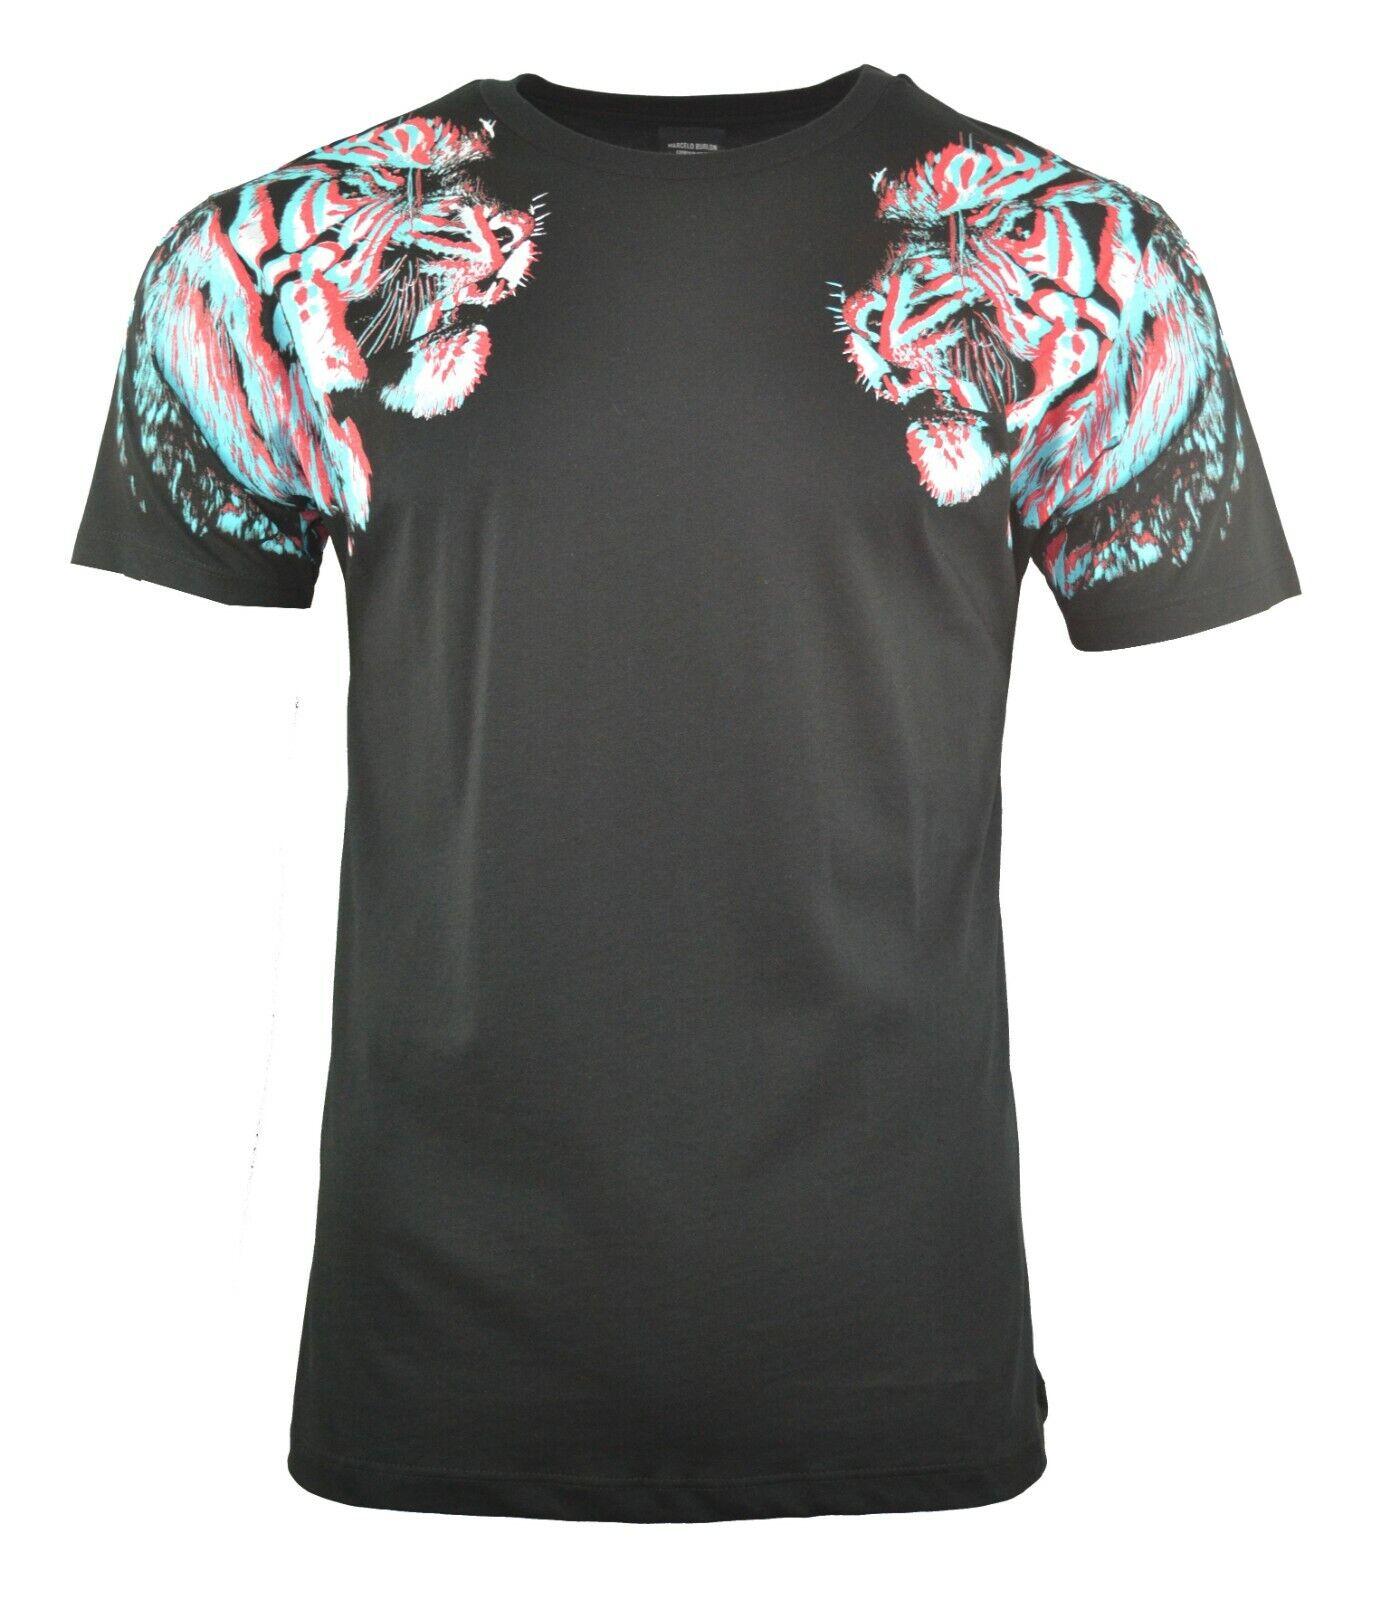 BNWT MARCELO BURLON Testa Di Leone Stampa T-shirt nera nera nera RARA a5322a